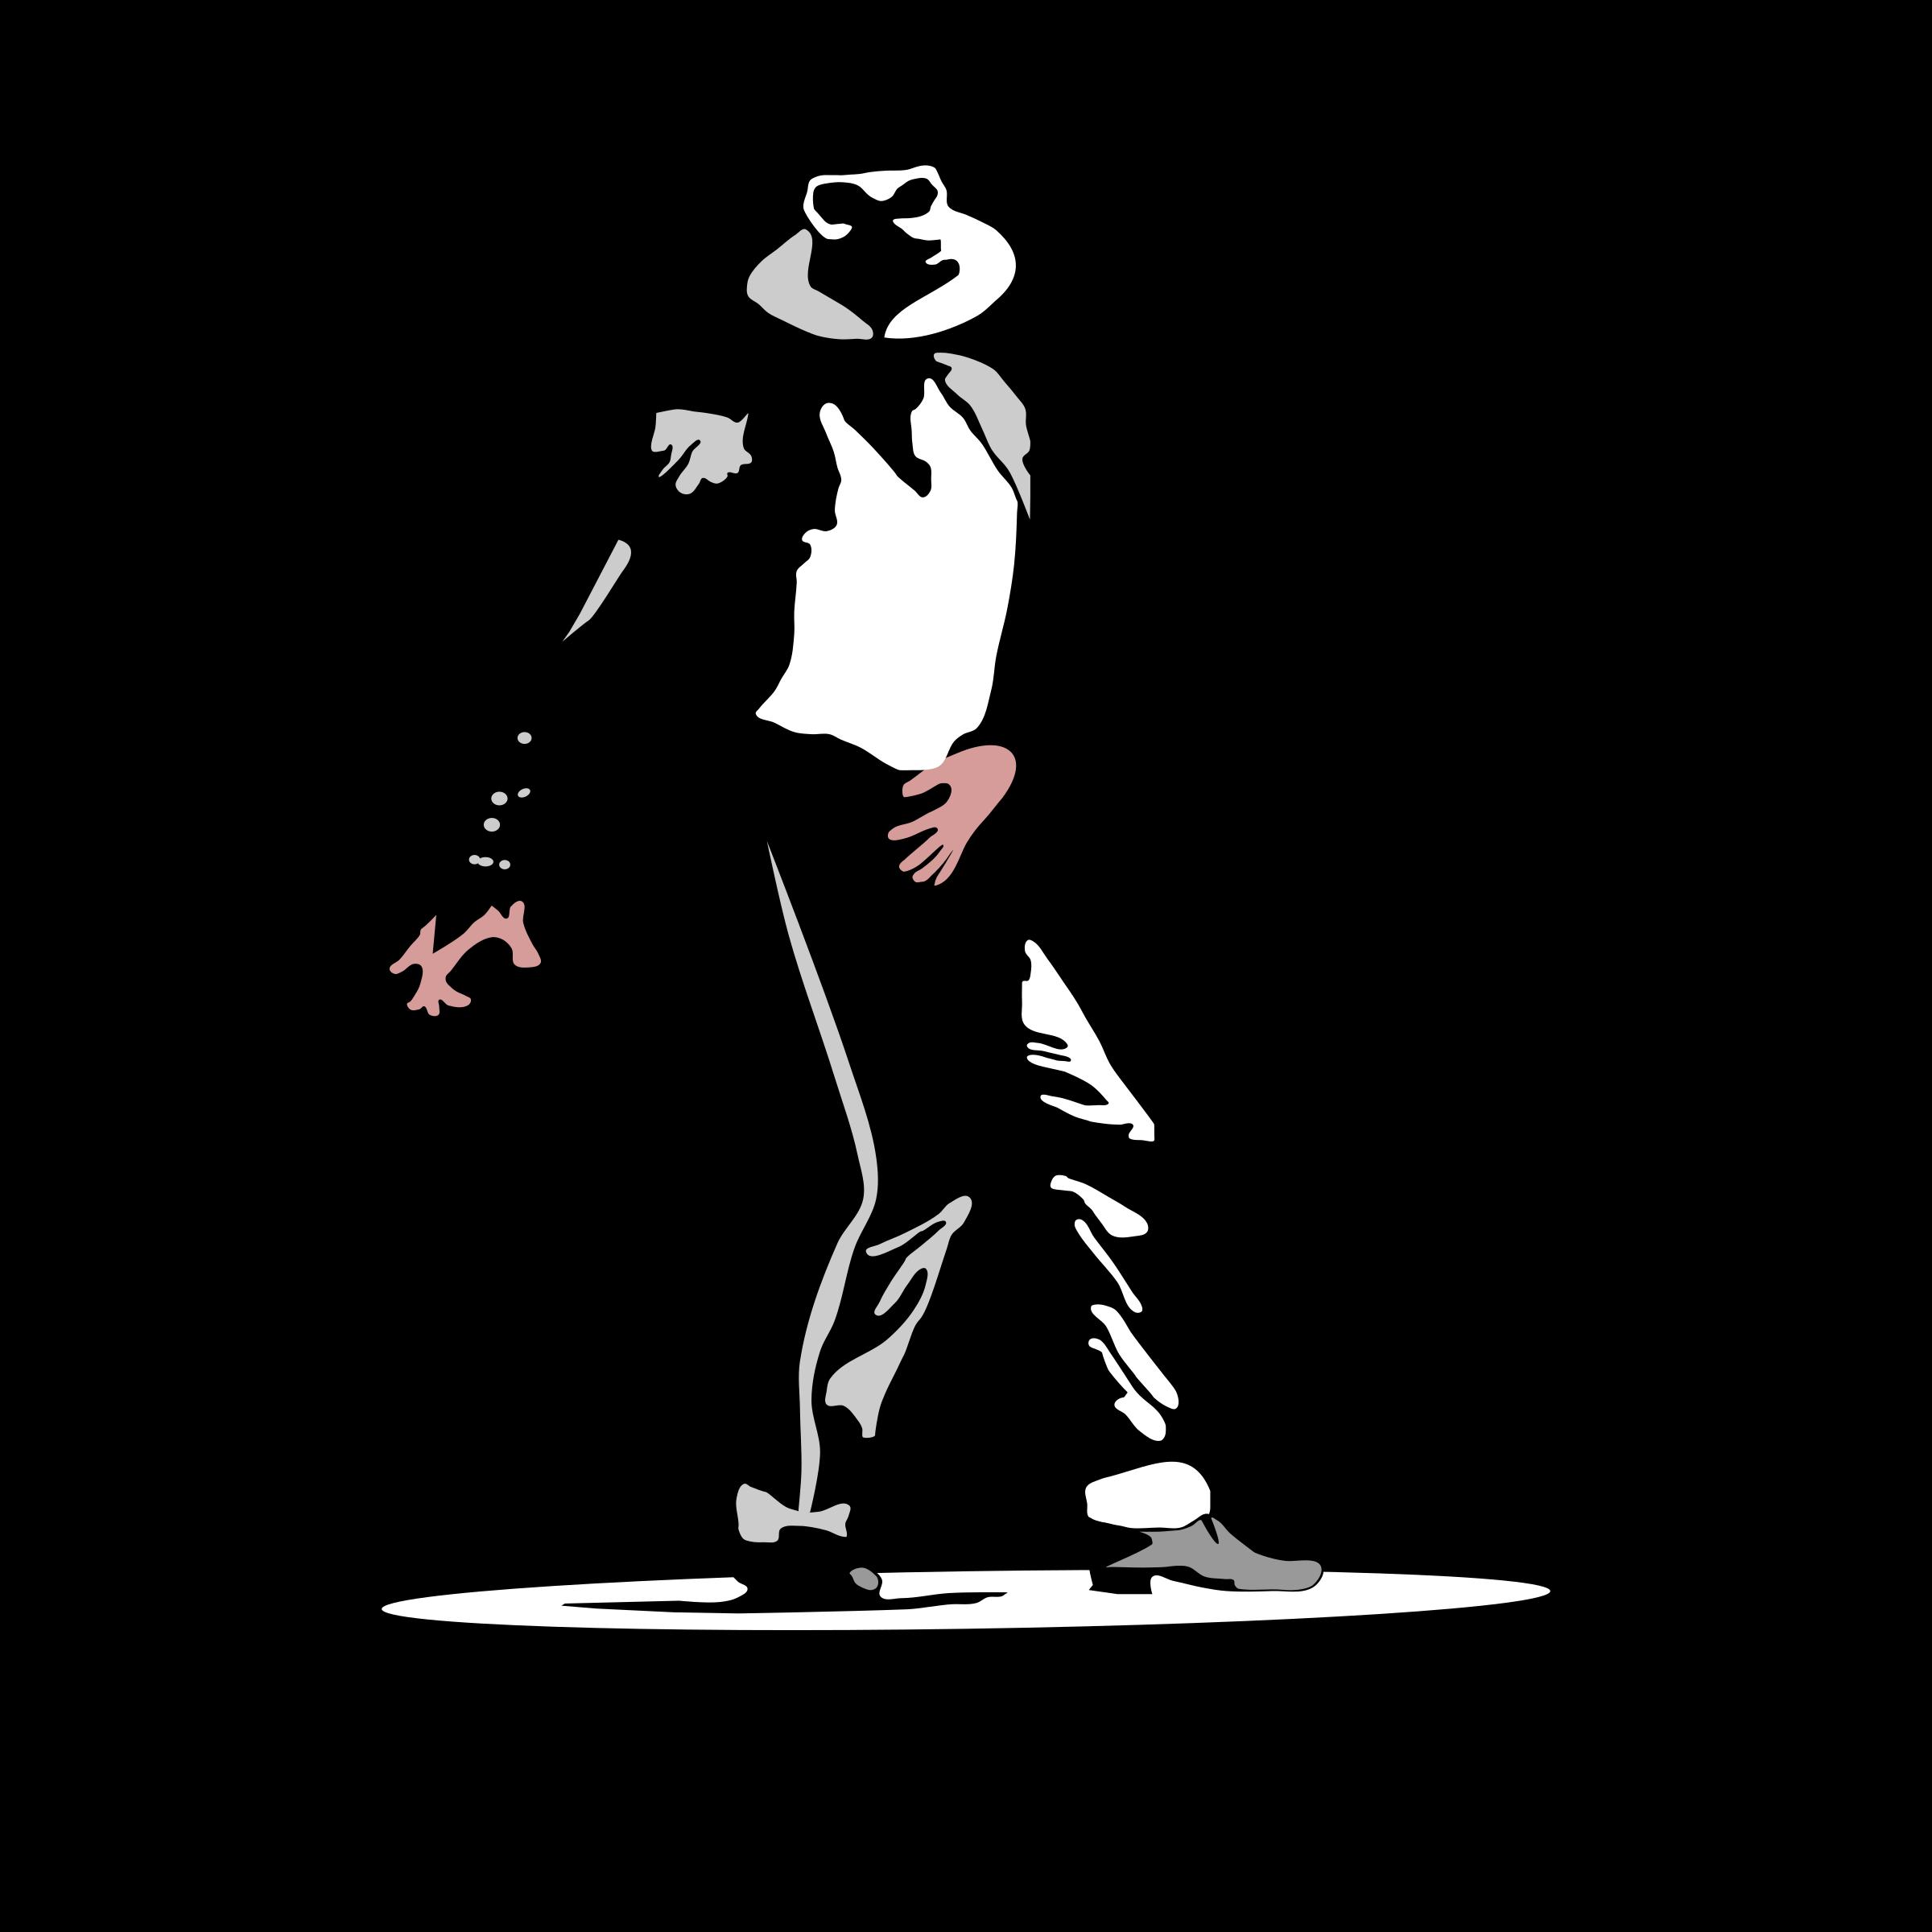 Pop Art clipart michael jackson #15